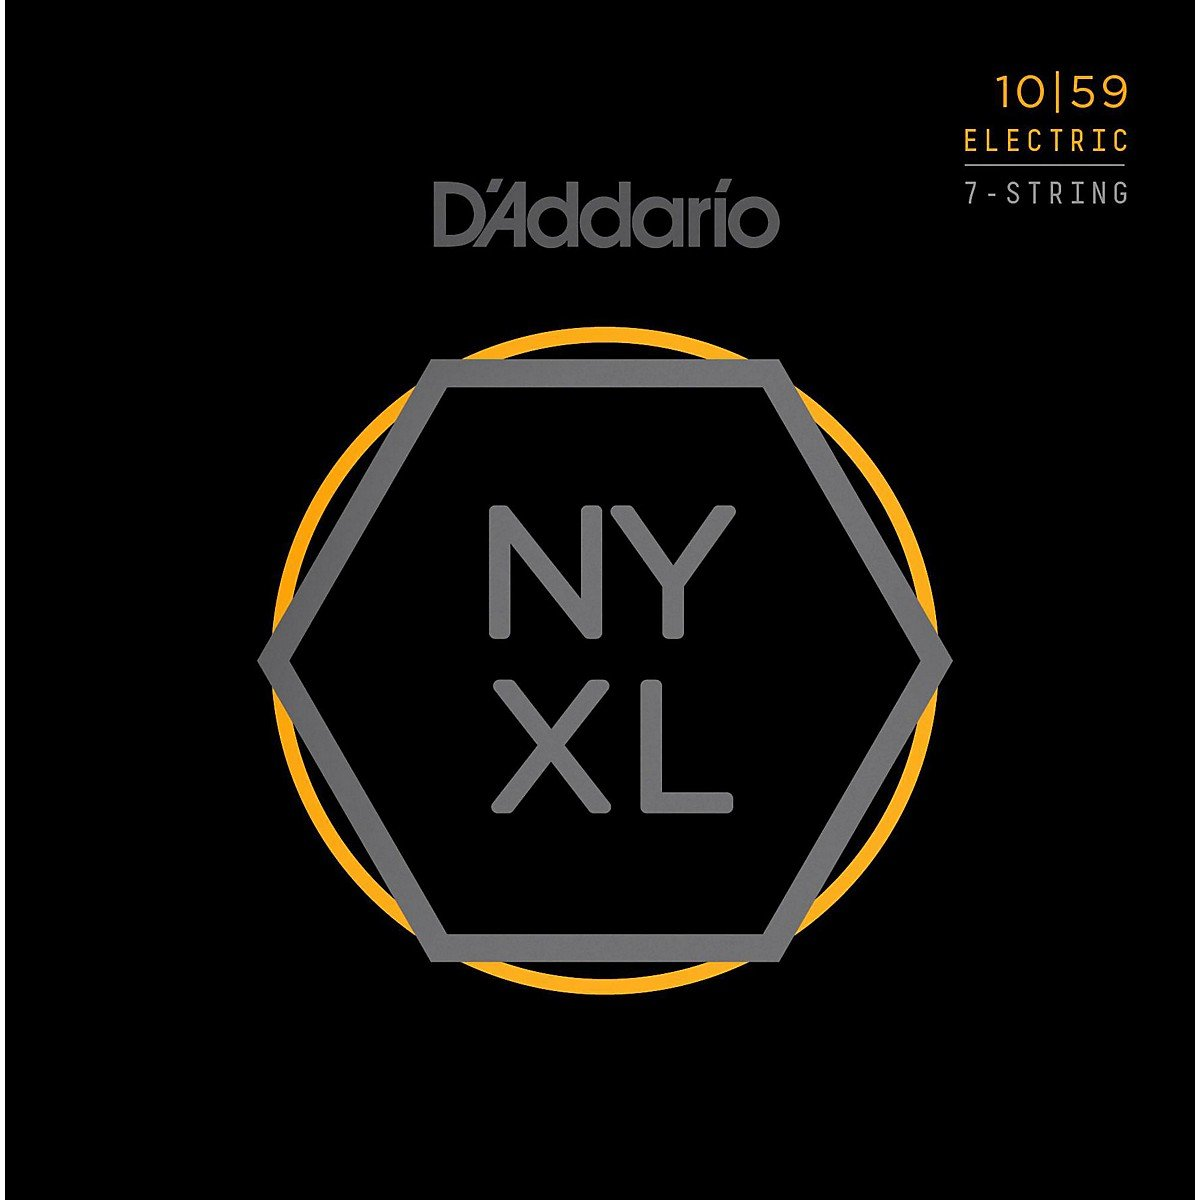 DAddario NYXL1059 7-String Electric Guitar Strings 10-59